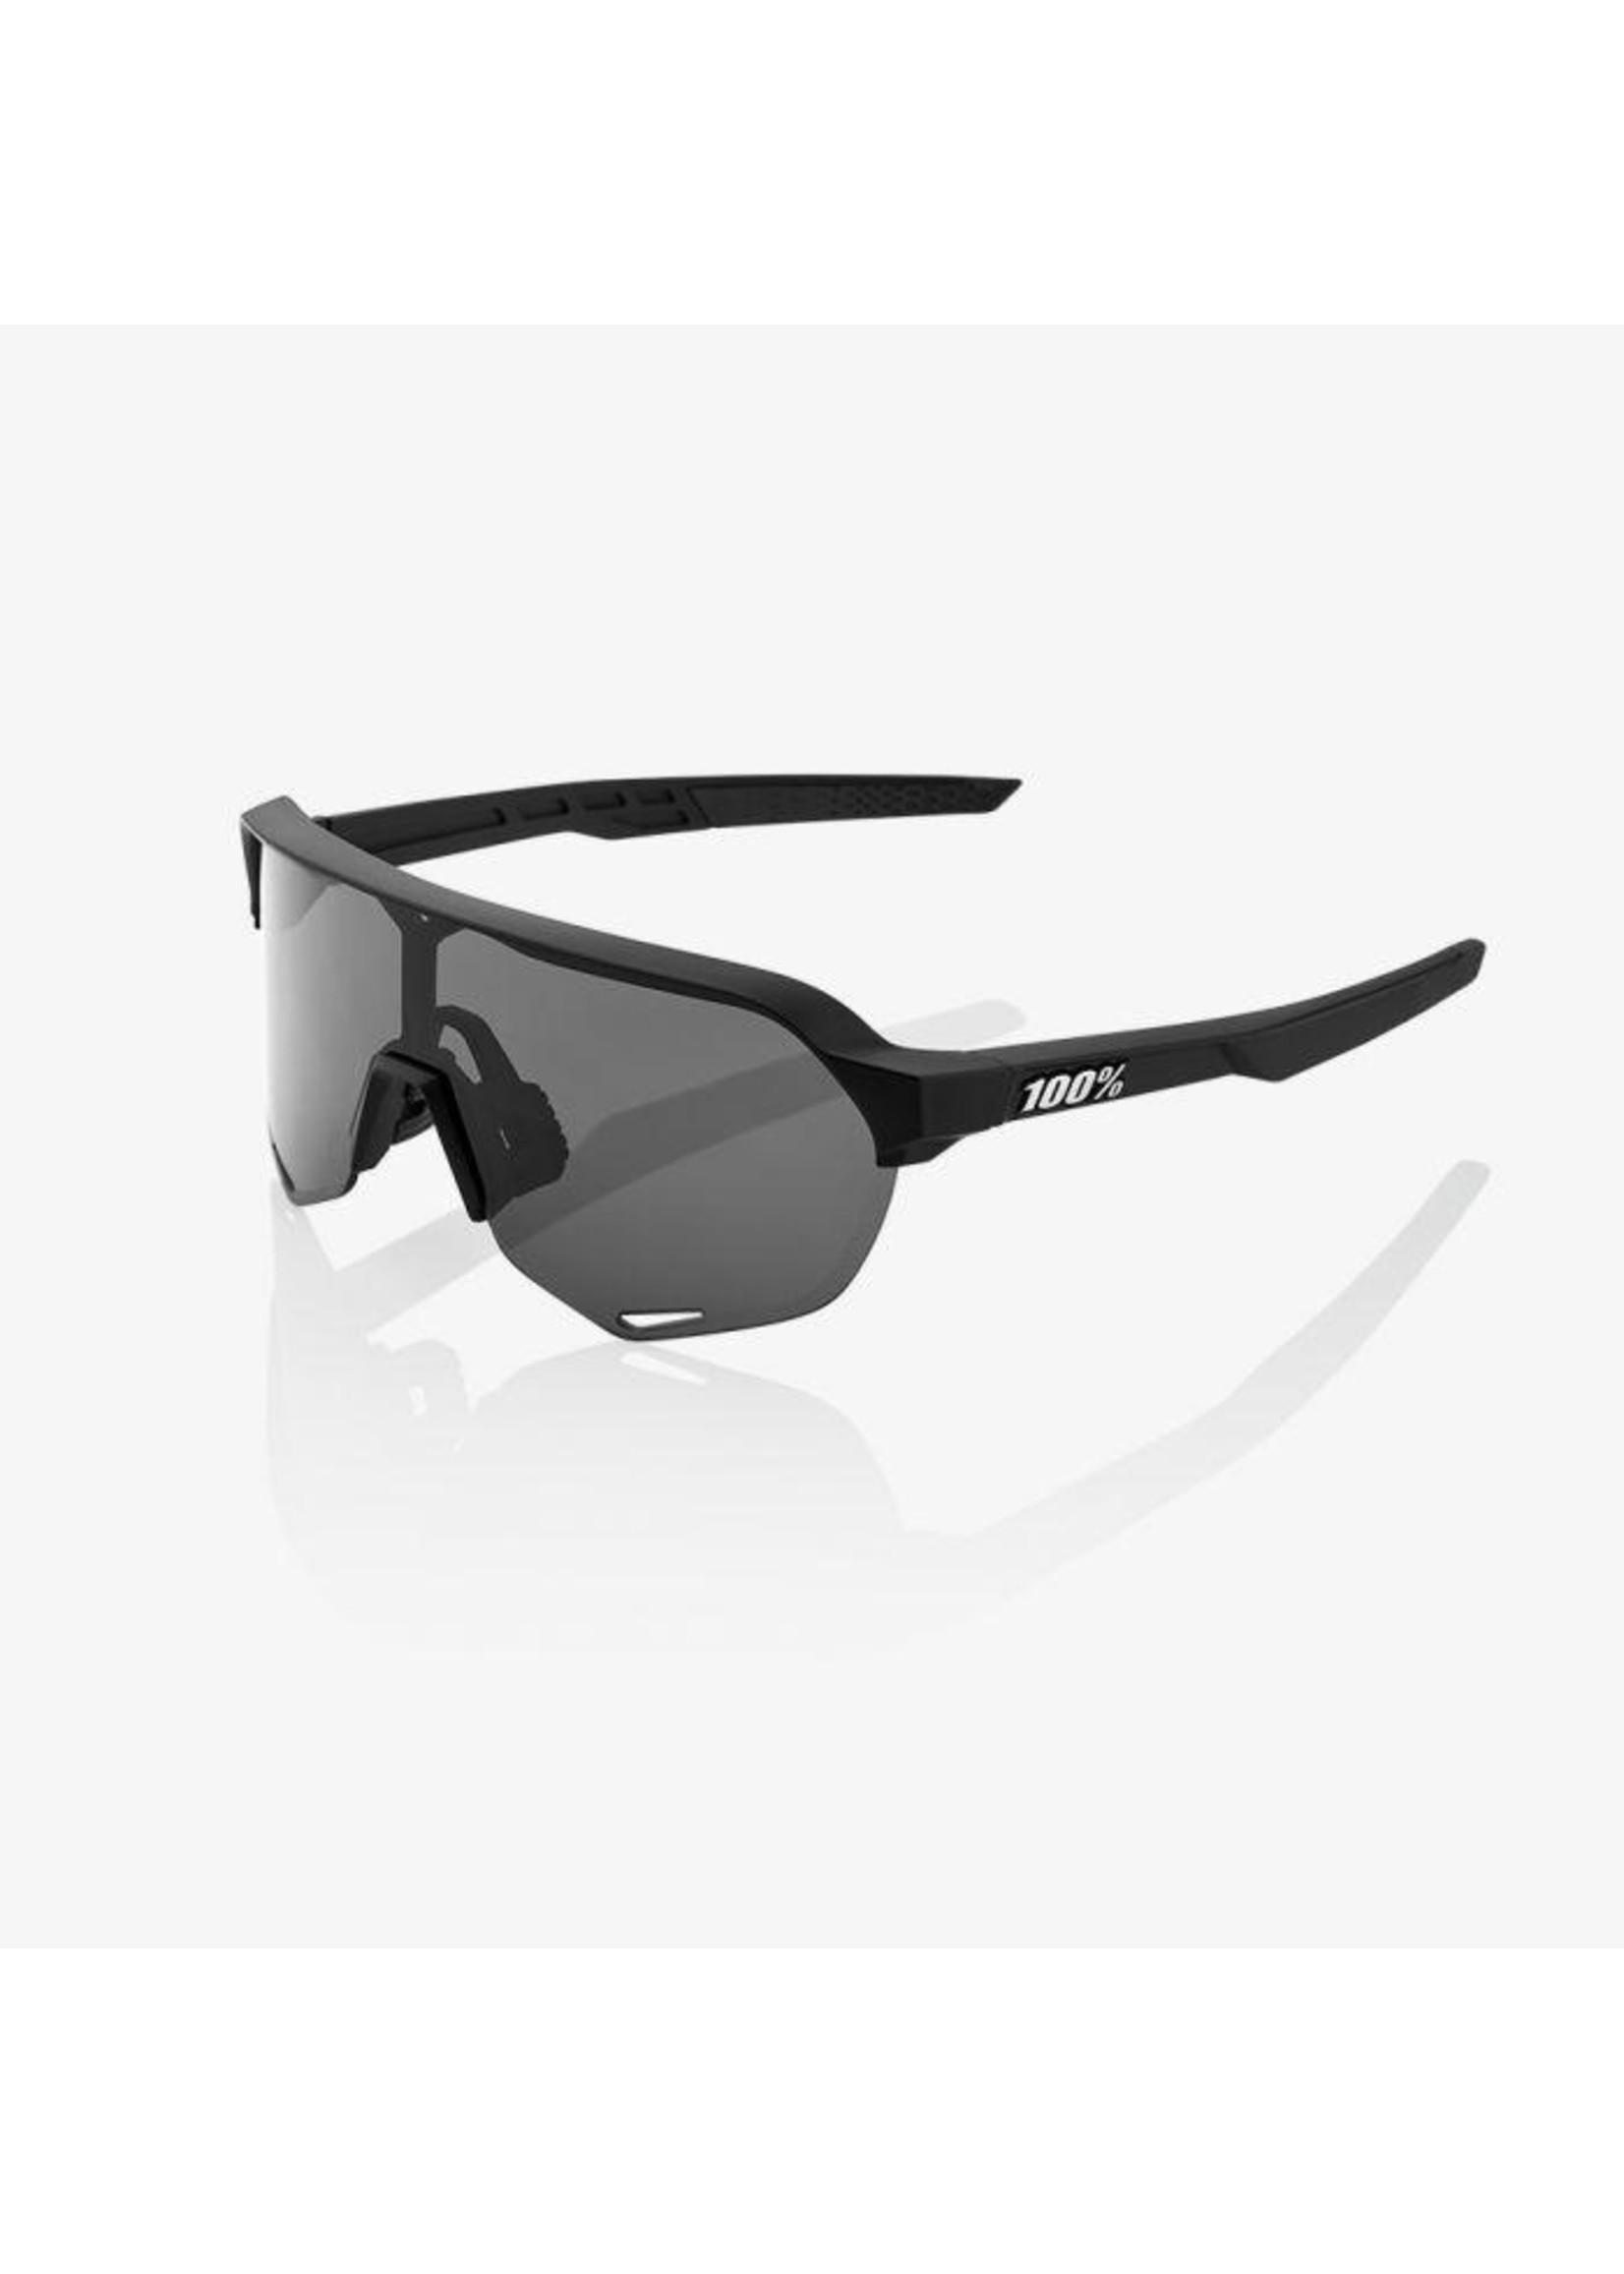 100% 100% S2 Sunglasses